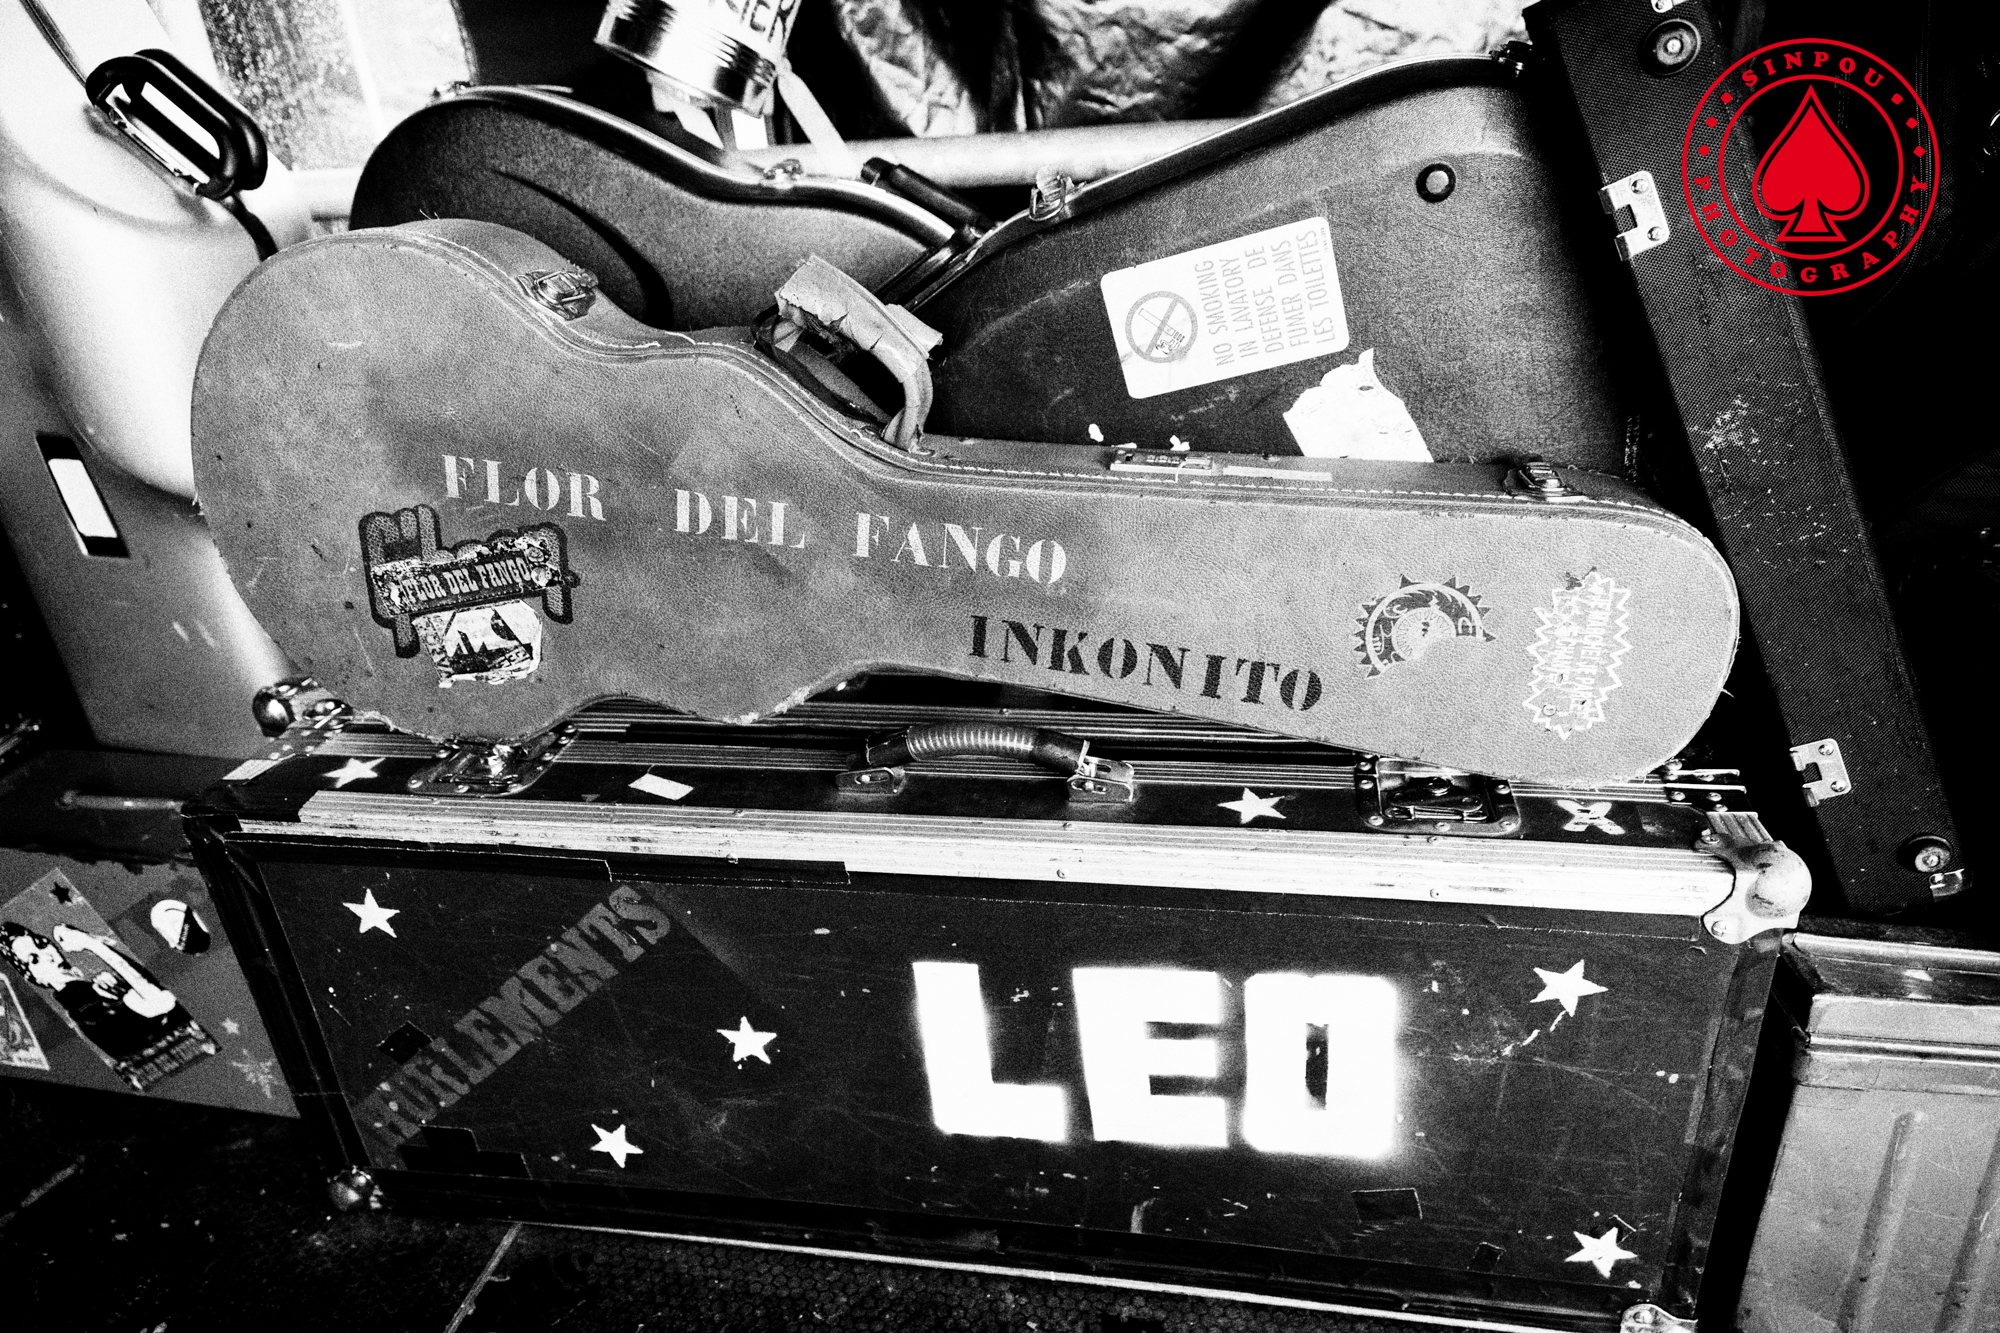 Les Hurlements d'Léo